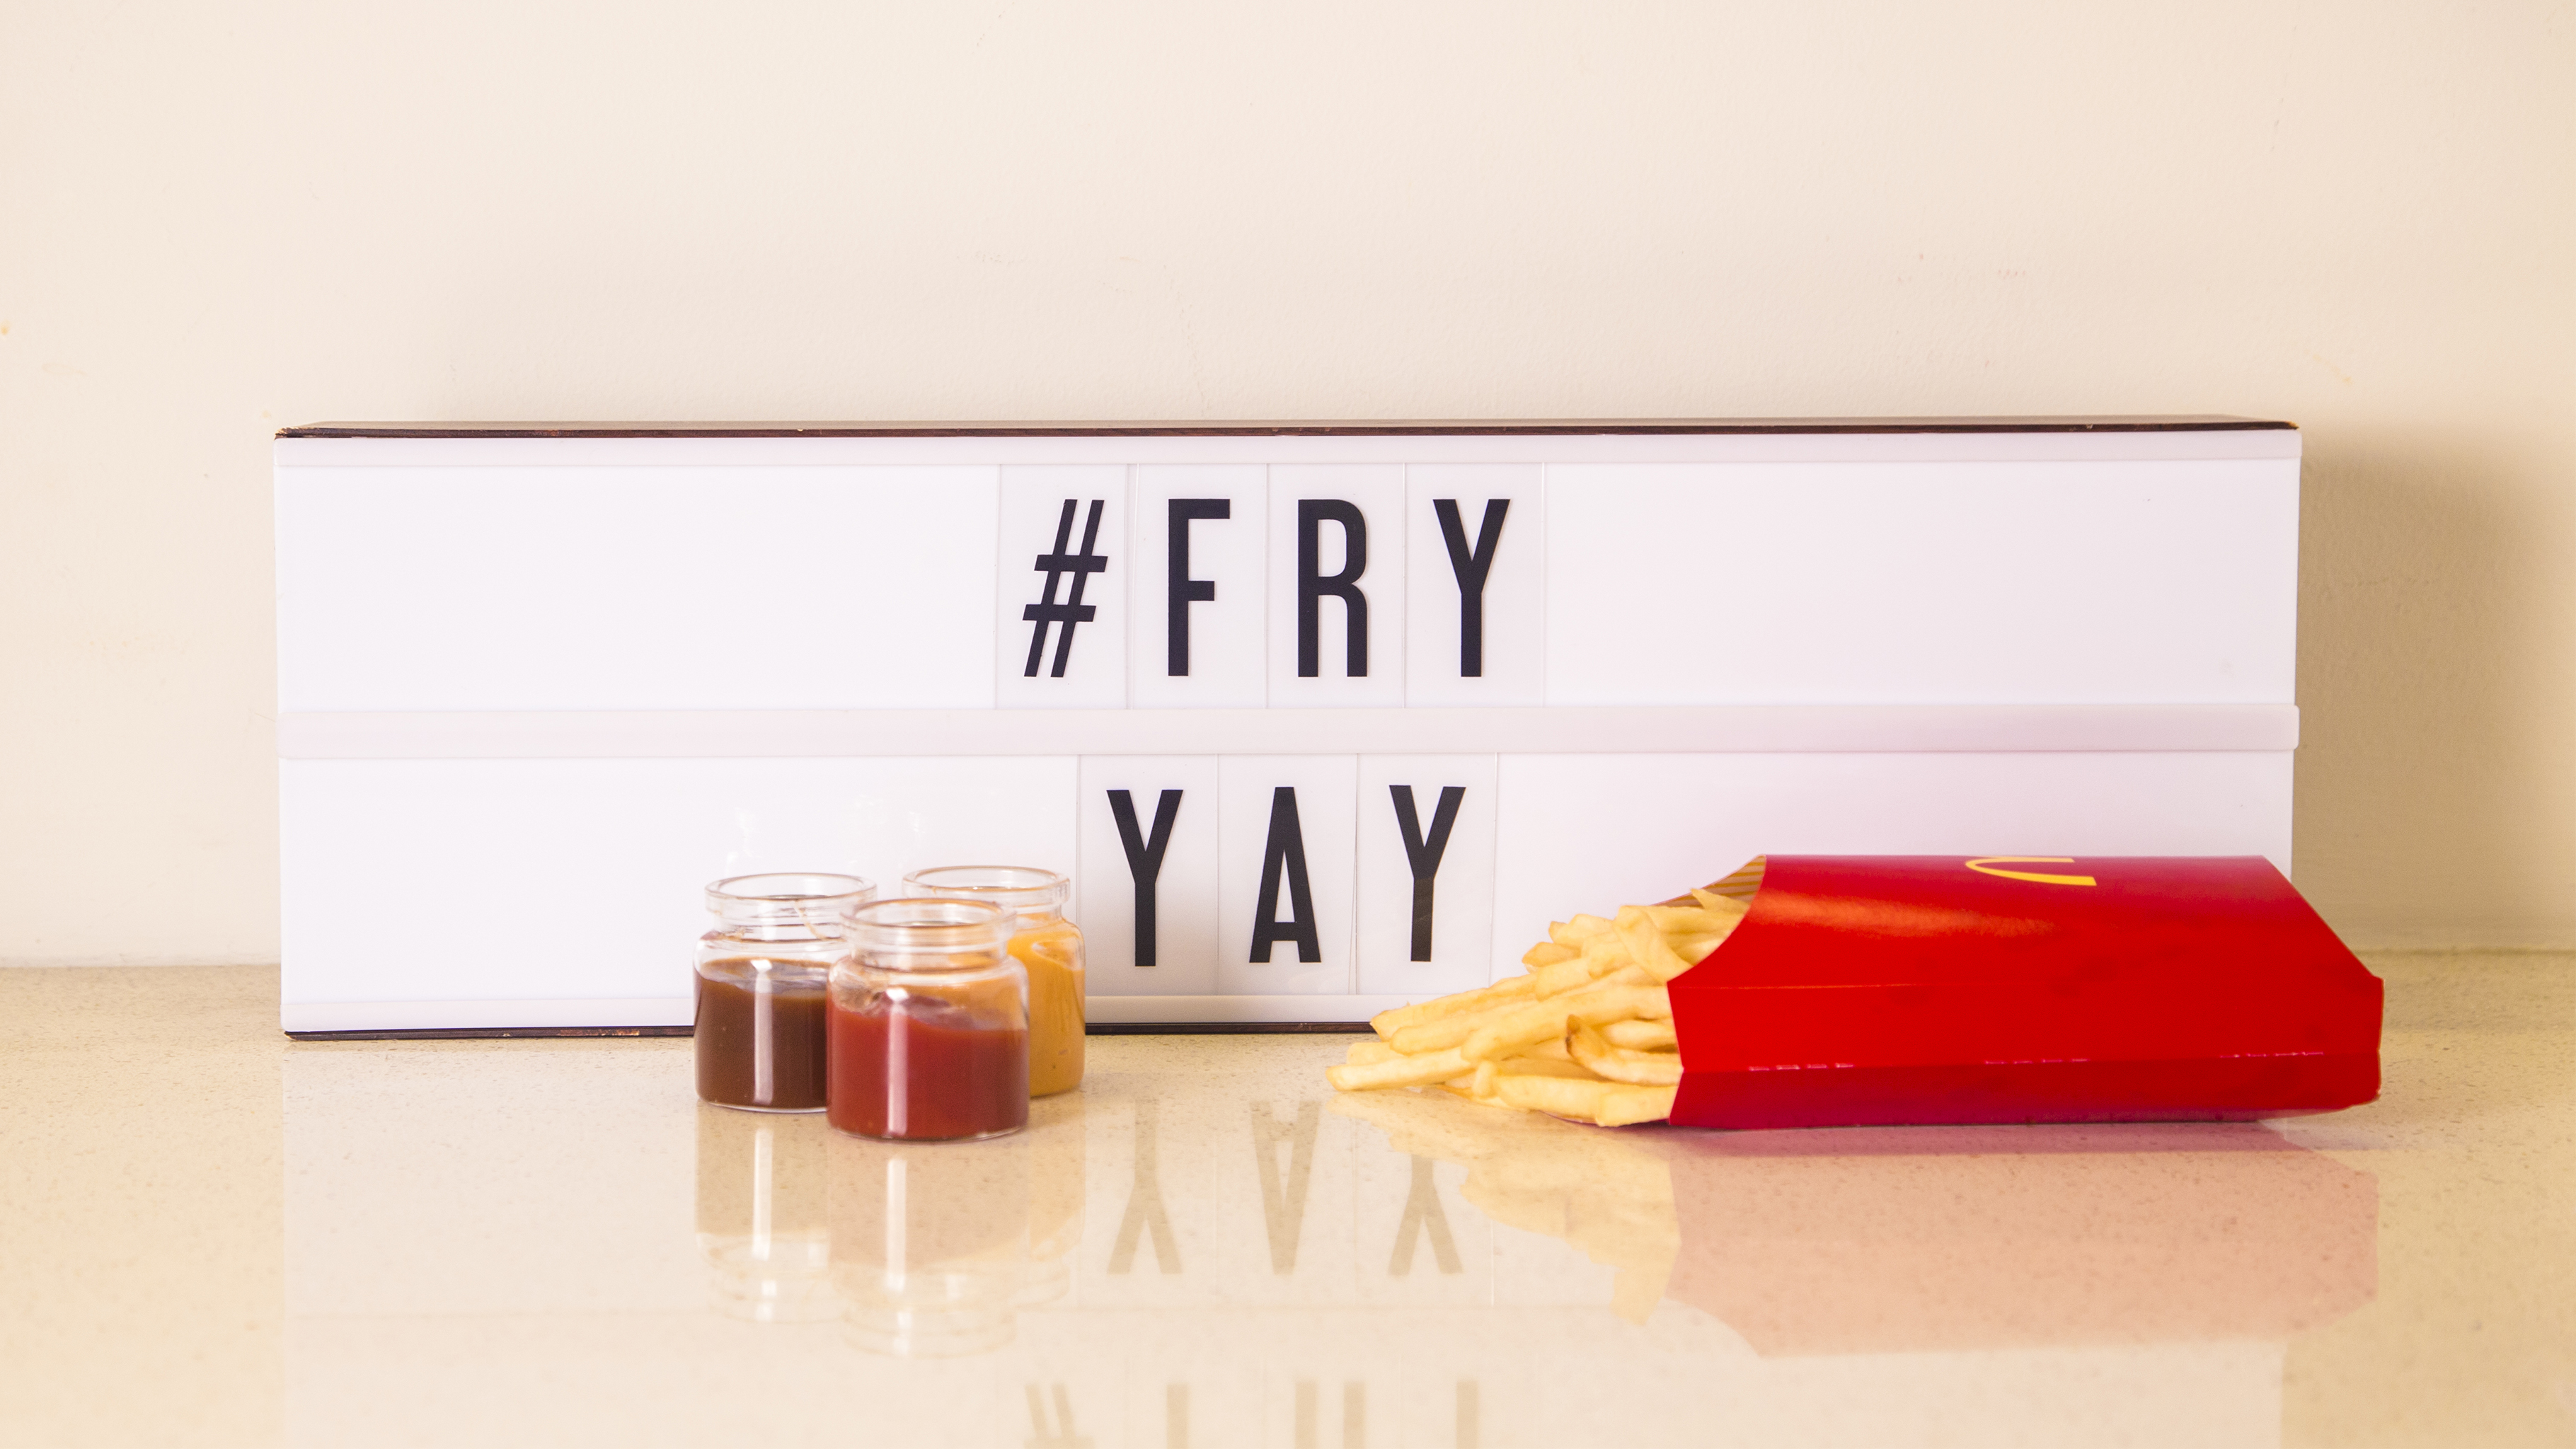 Fry-yay_v01_cropped